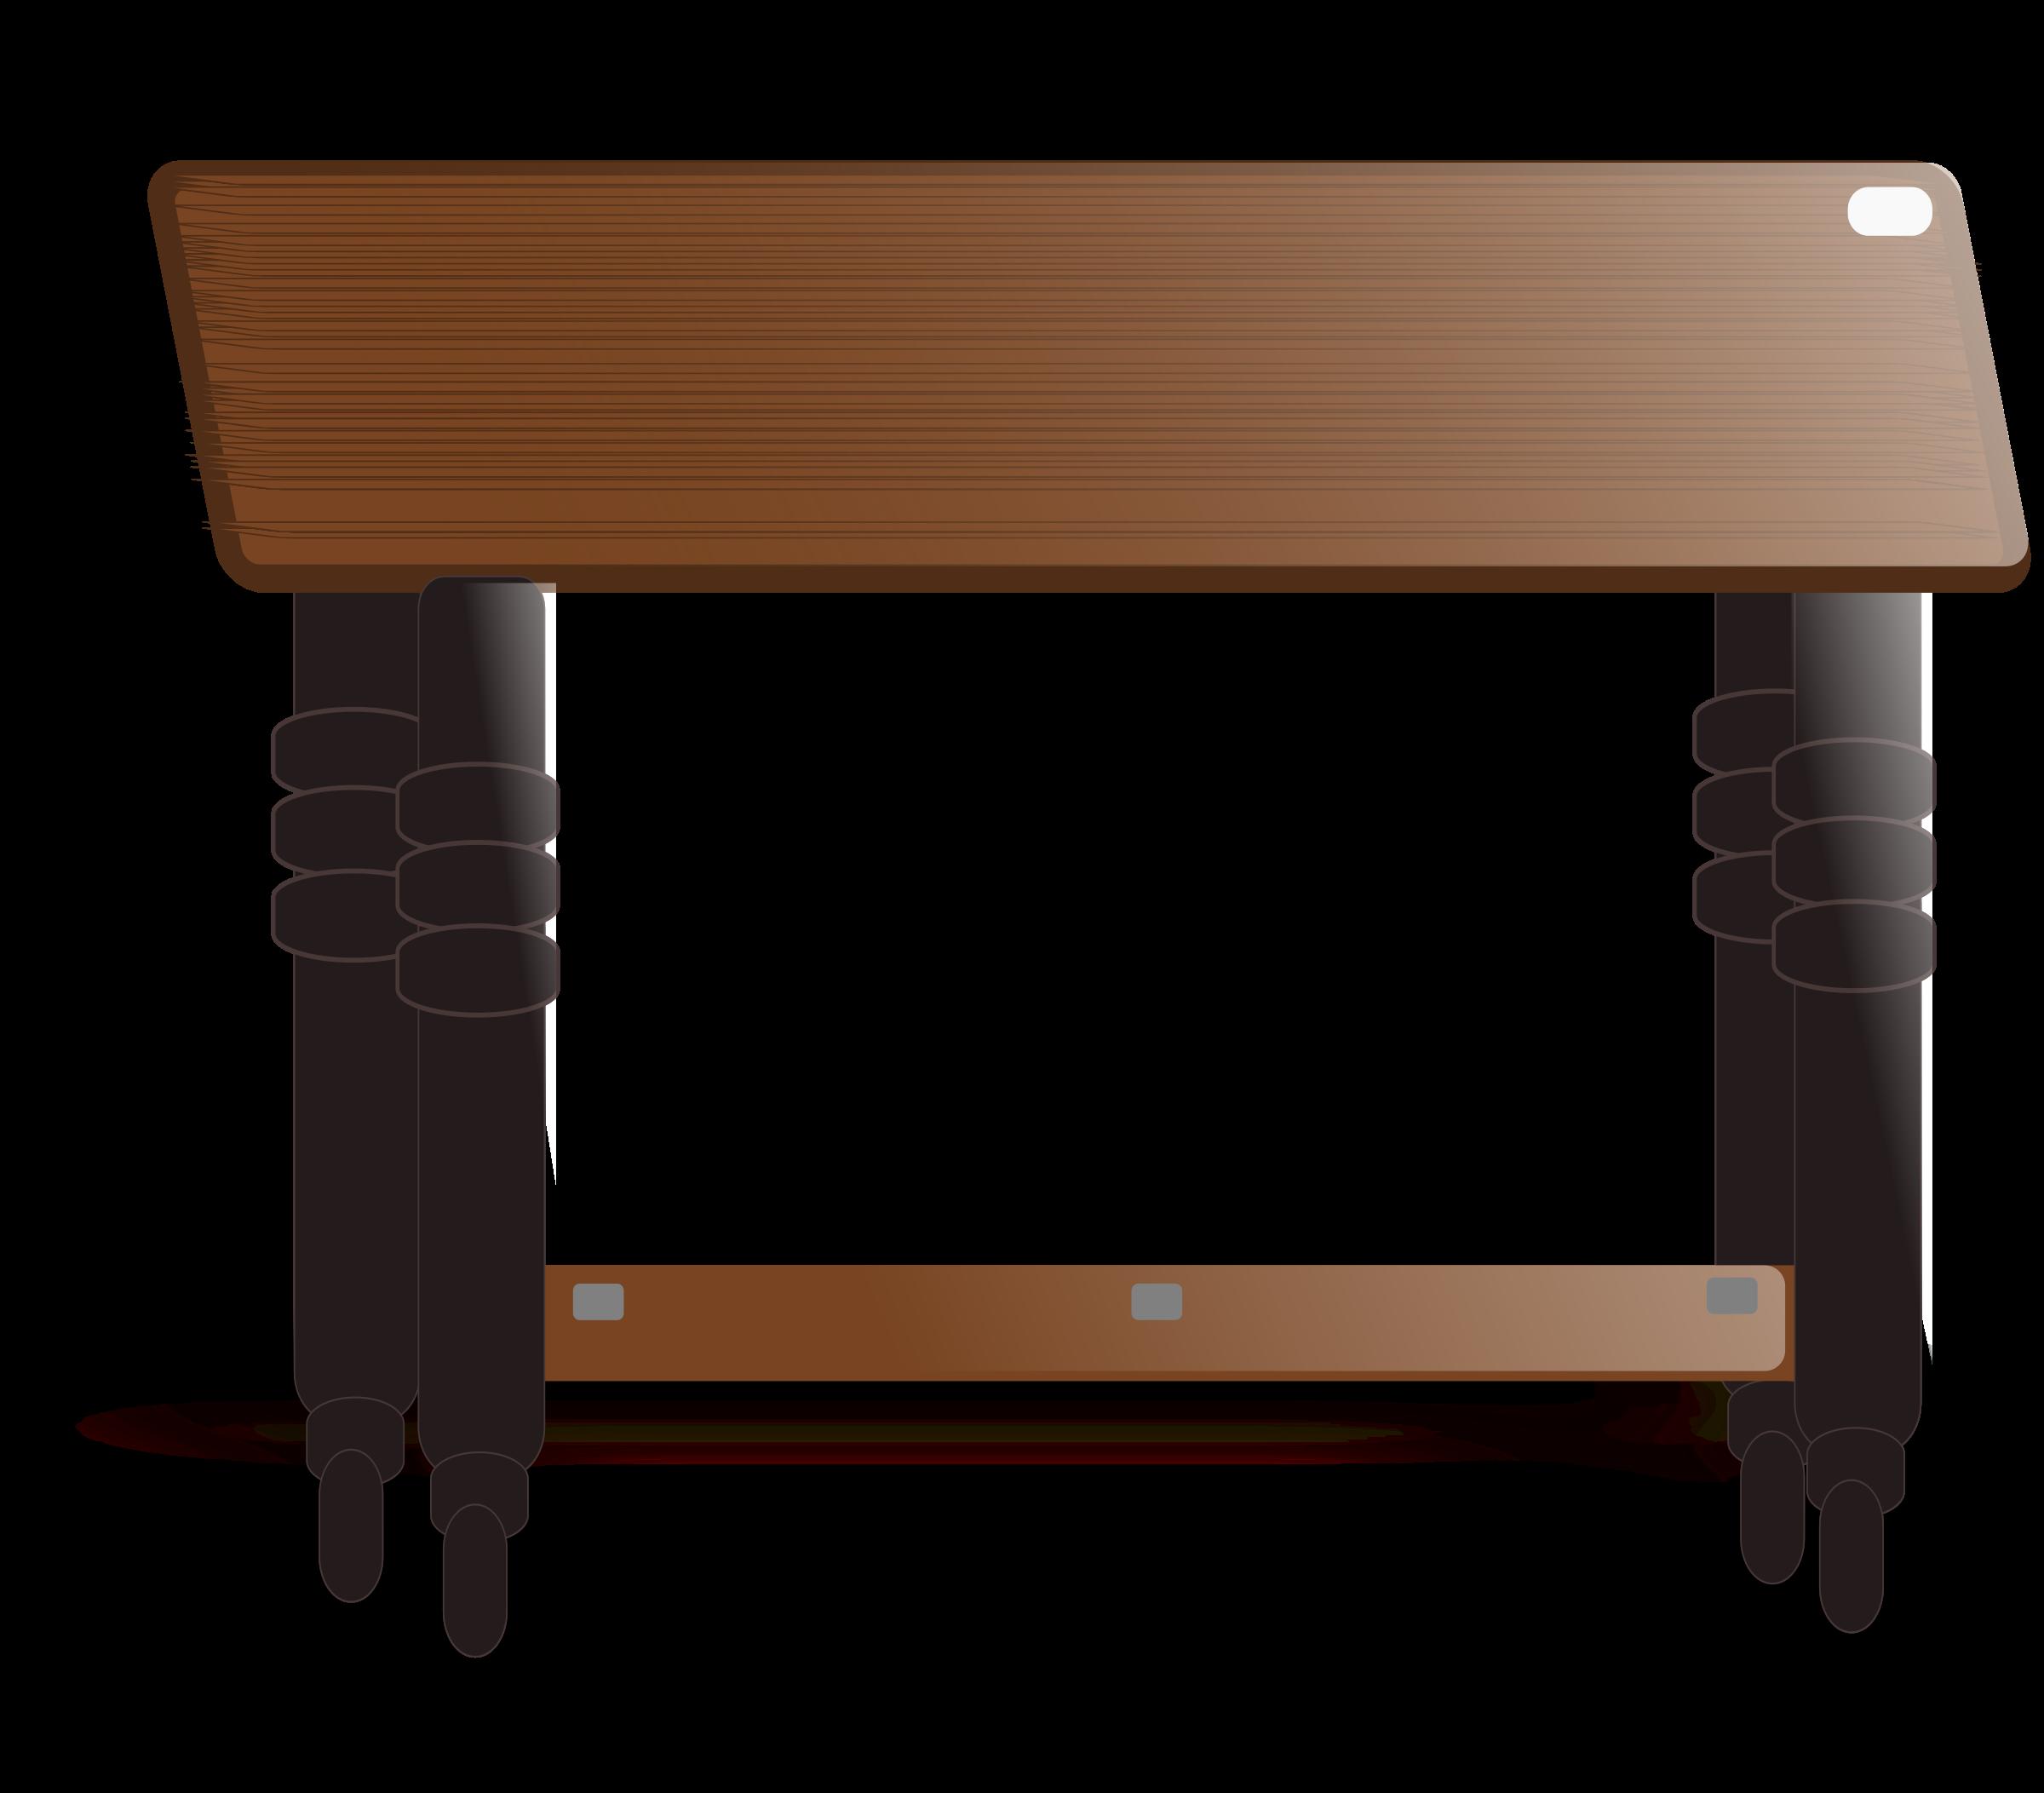 Teak top big image. Clipart table fancy table